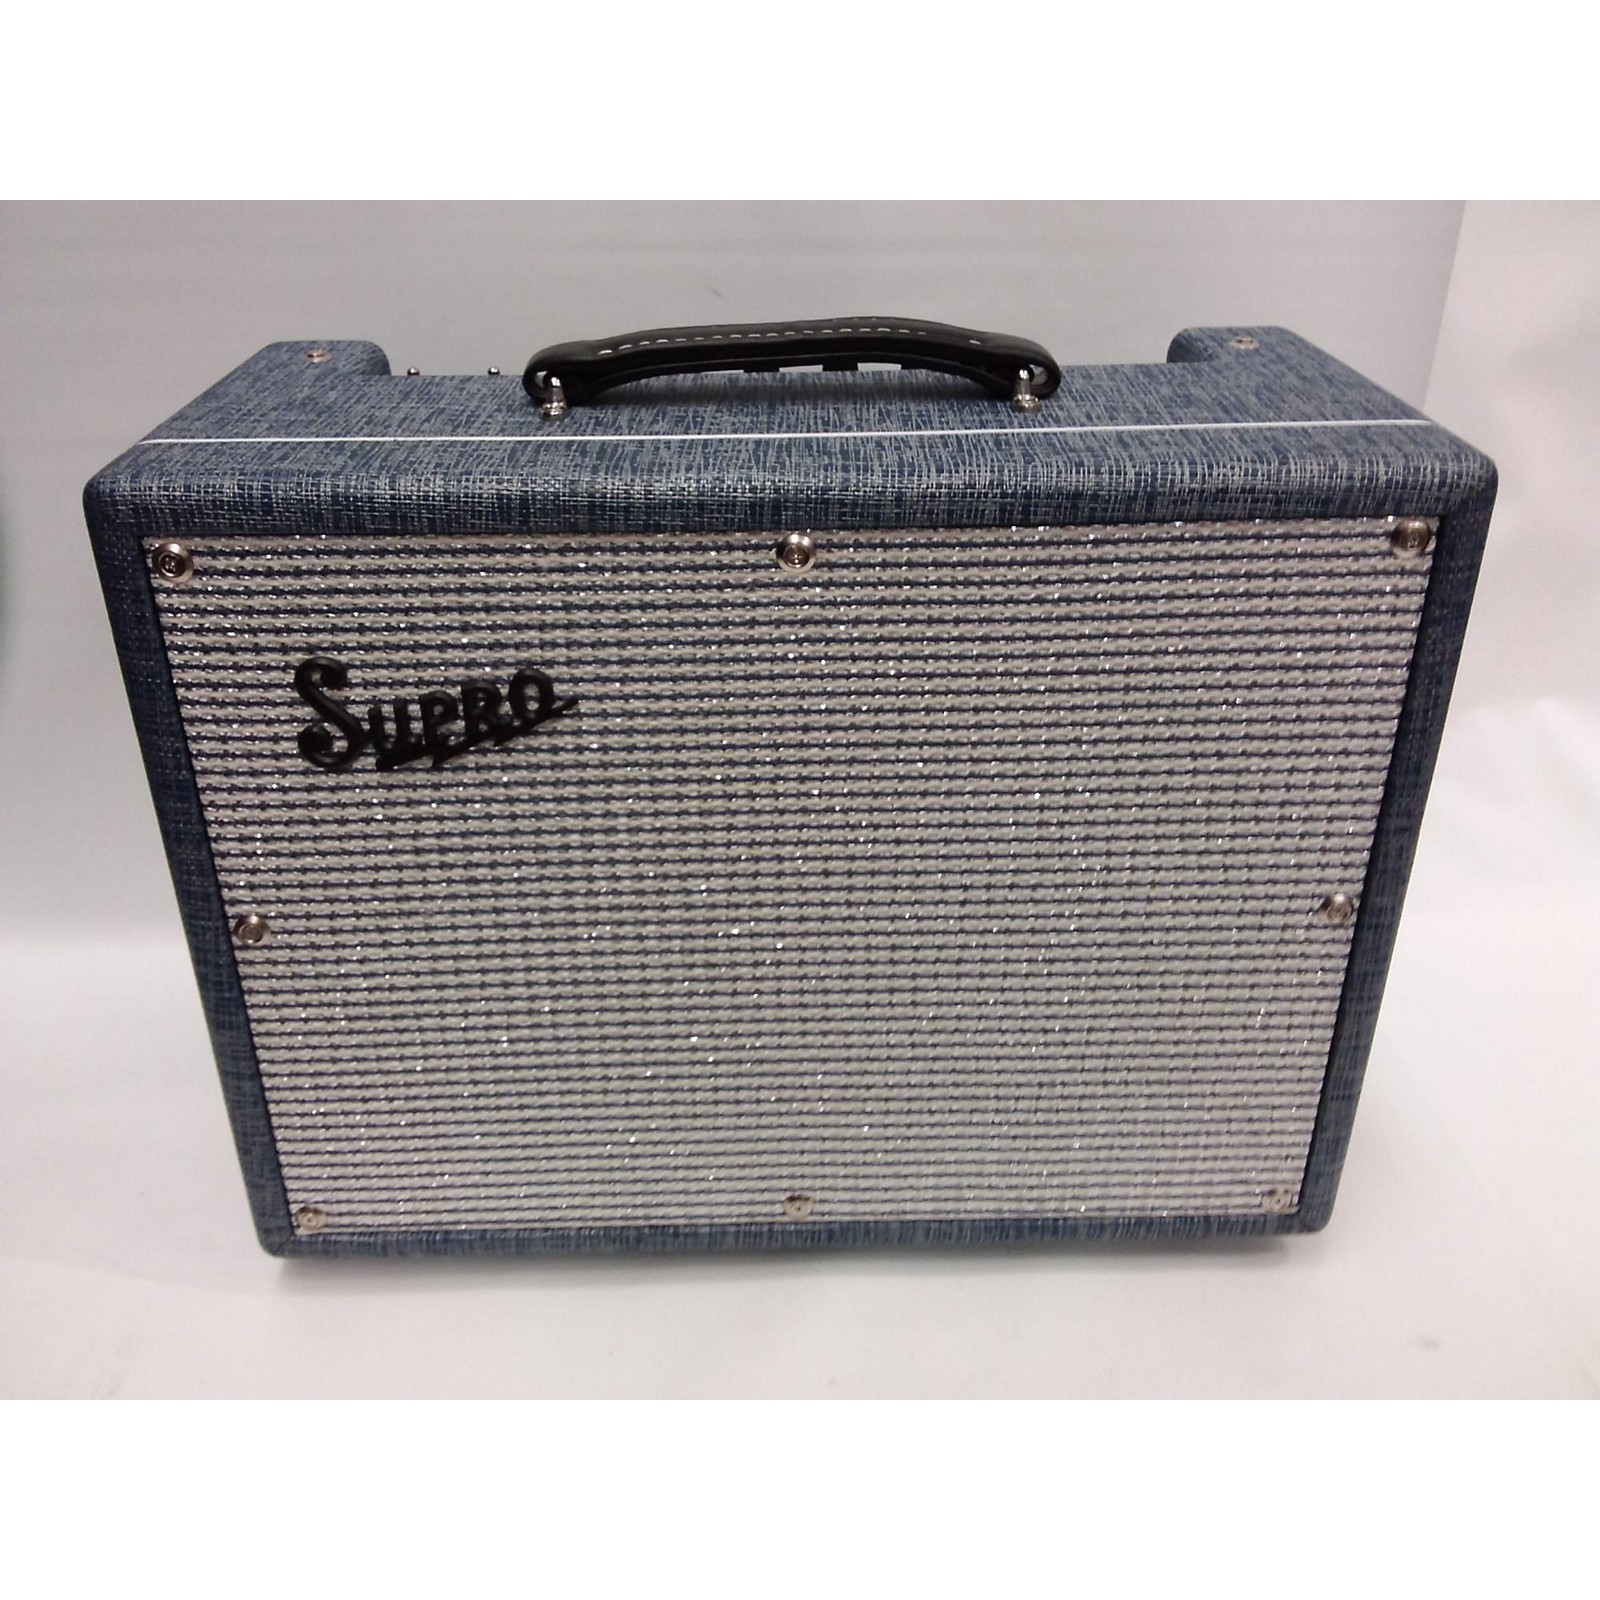 Supro Titan 1642rt Tube Guitar Combo Amp